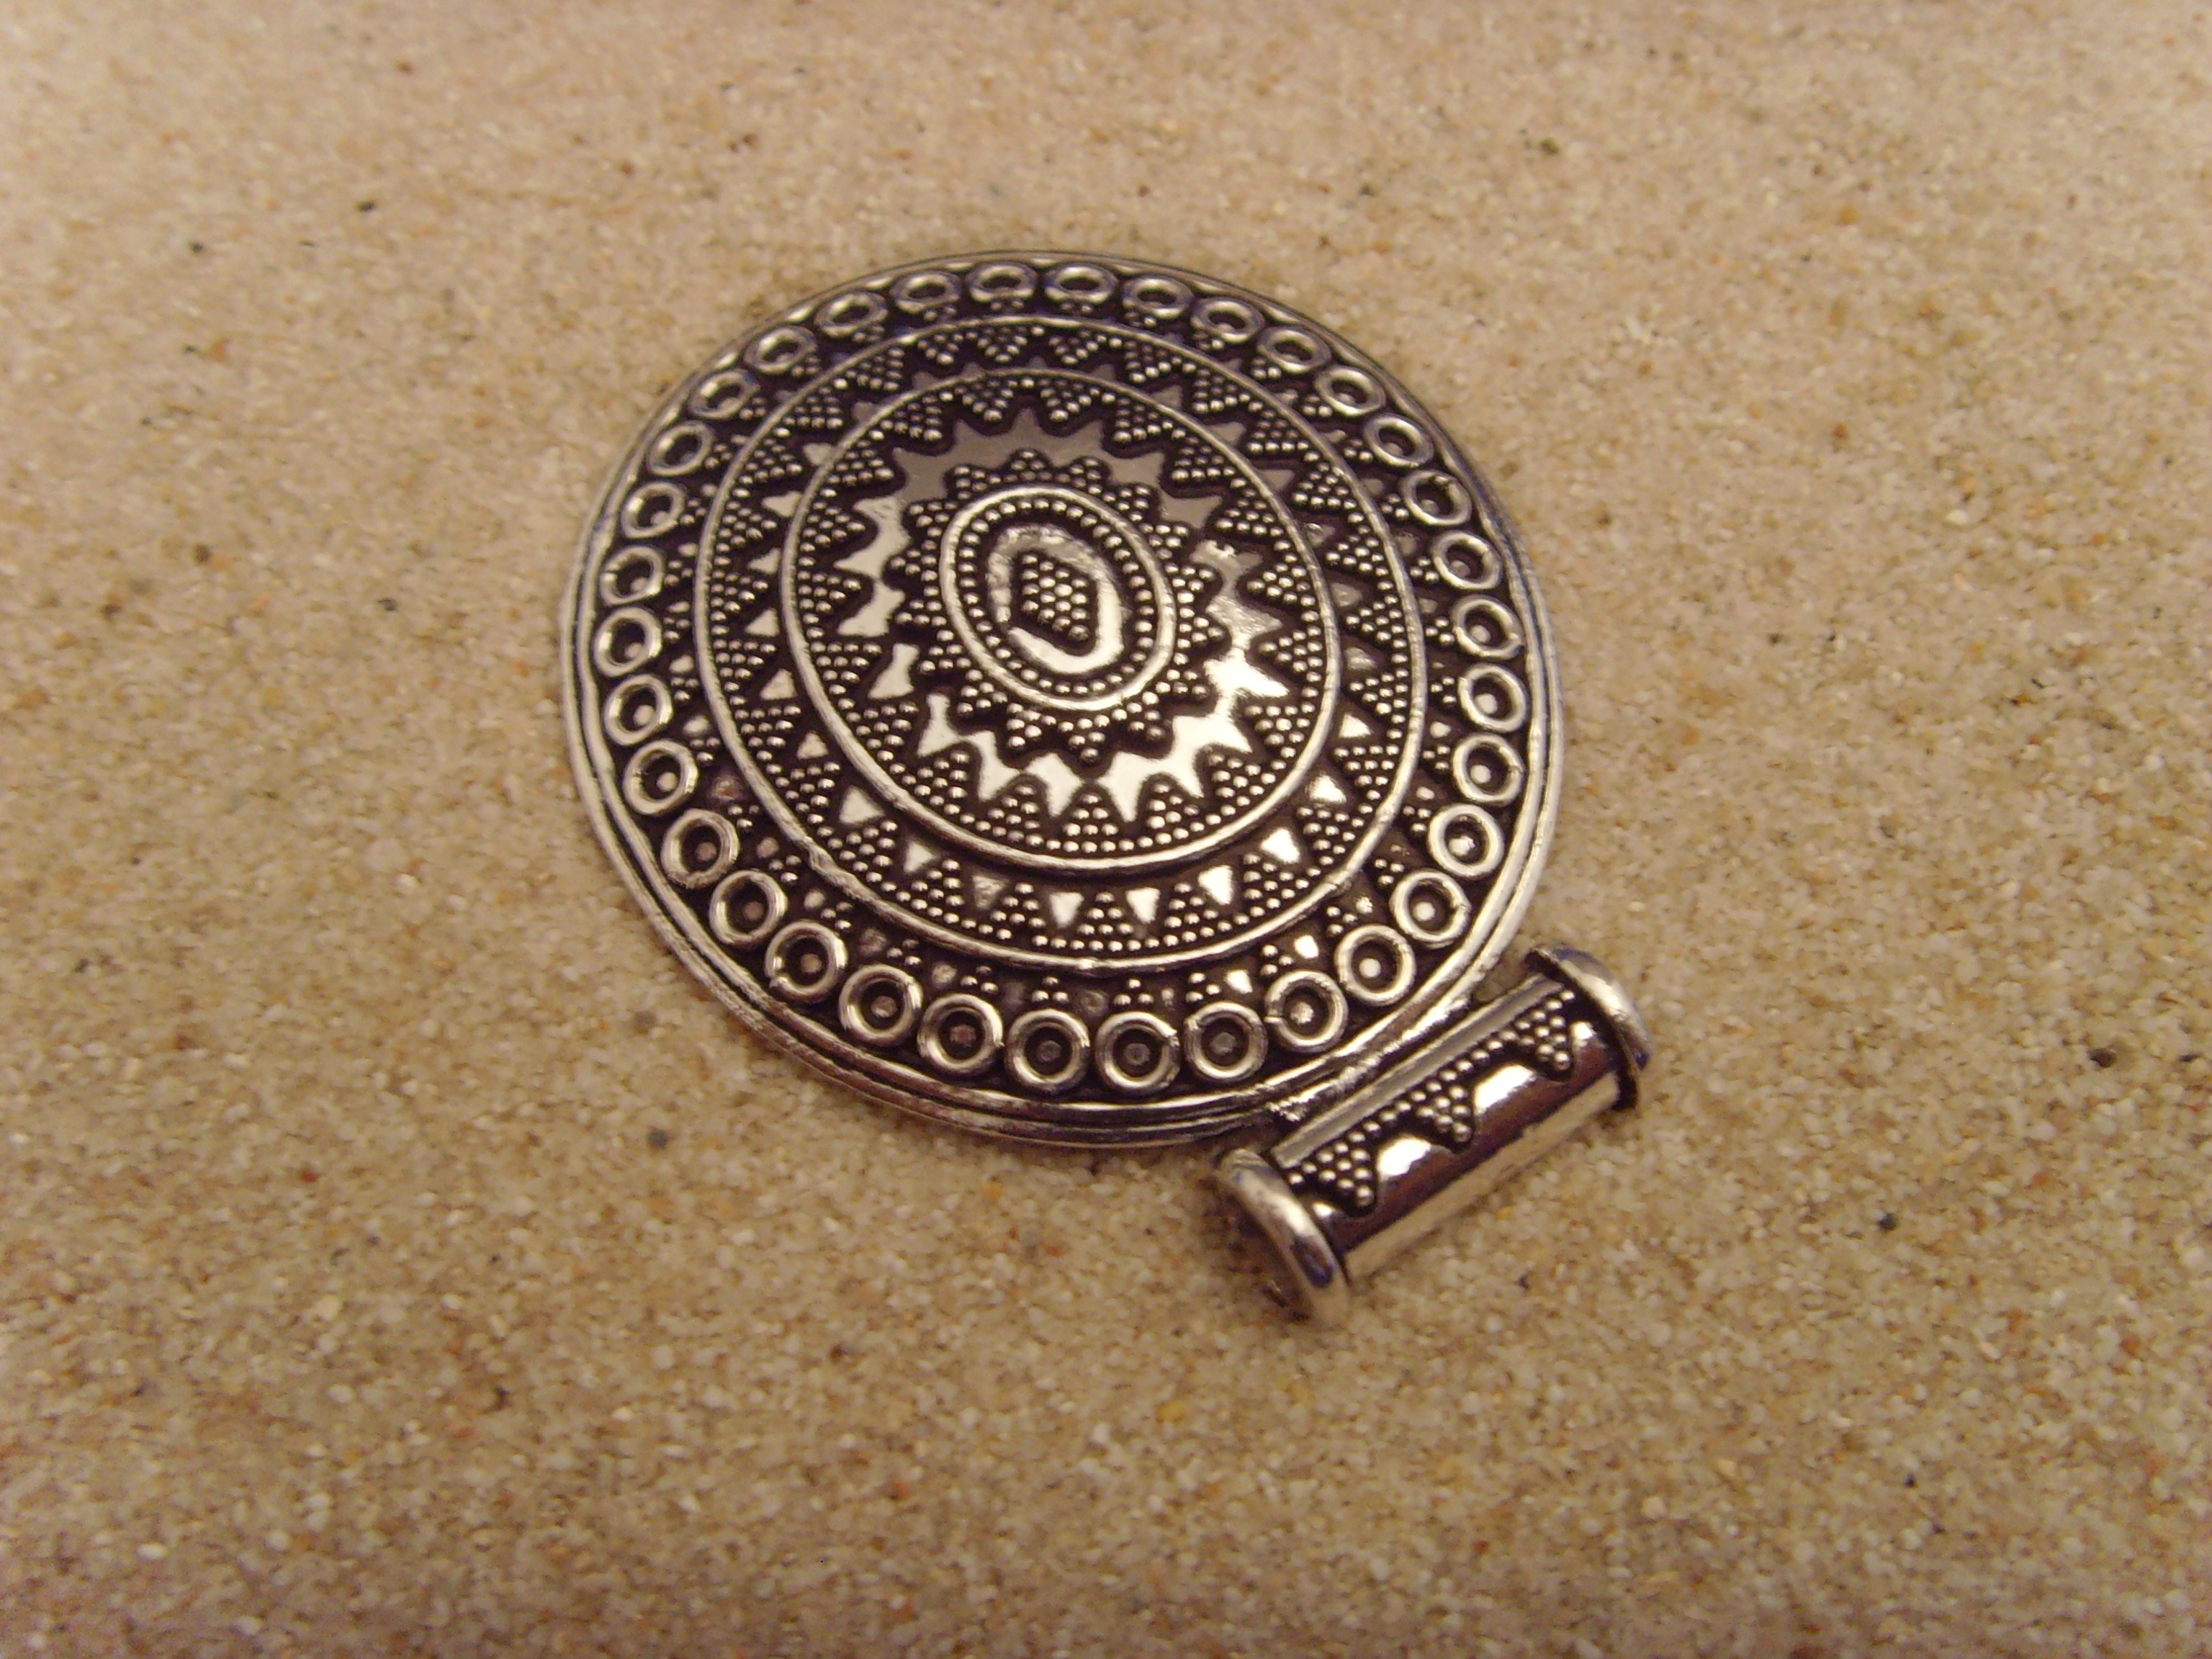 Silberanhänger (antikes-Design) - 925'er Silber